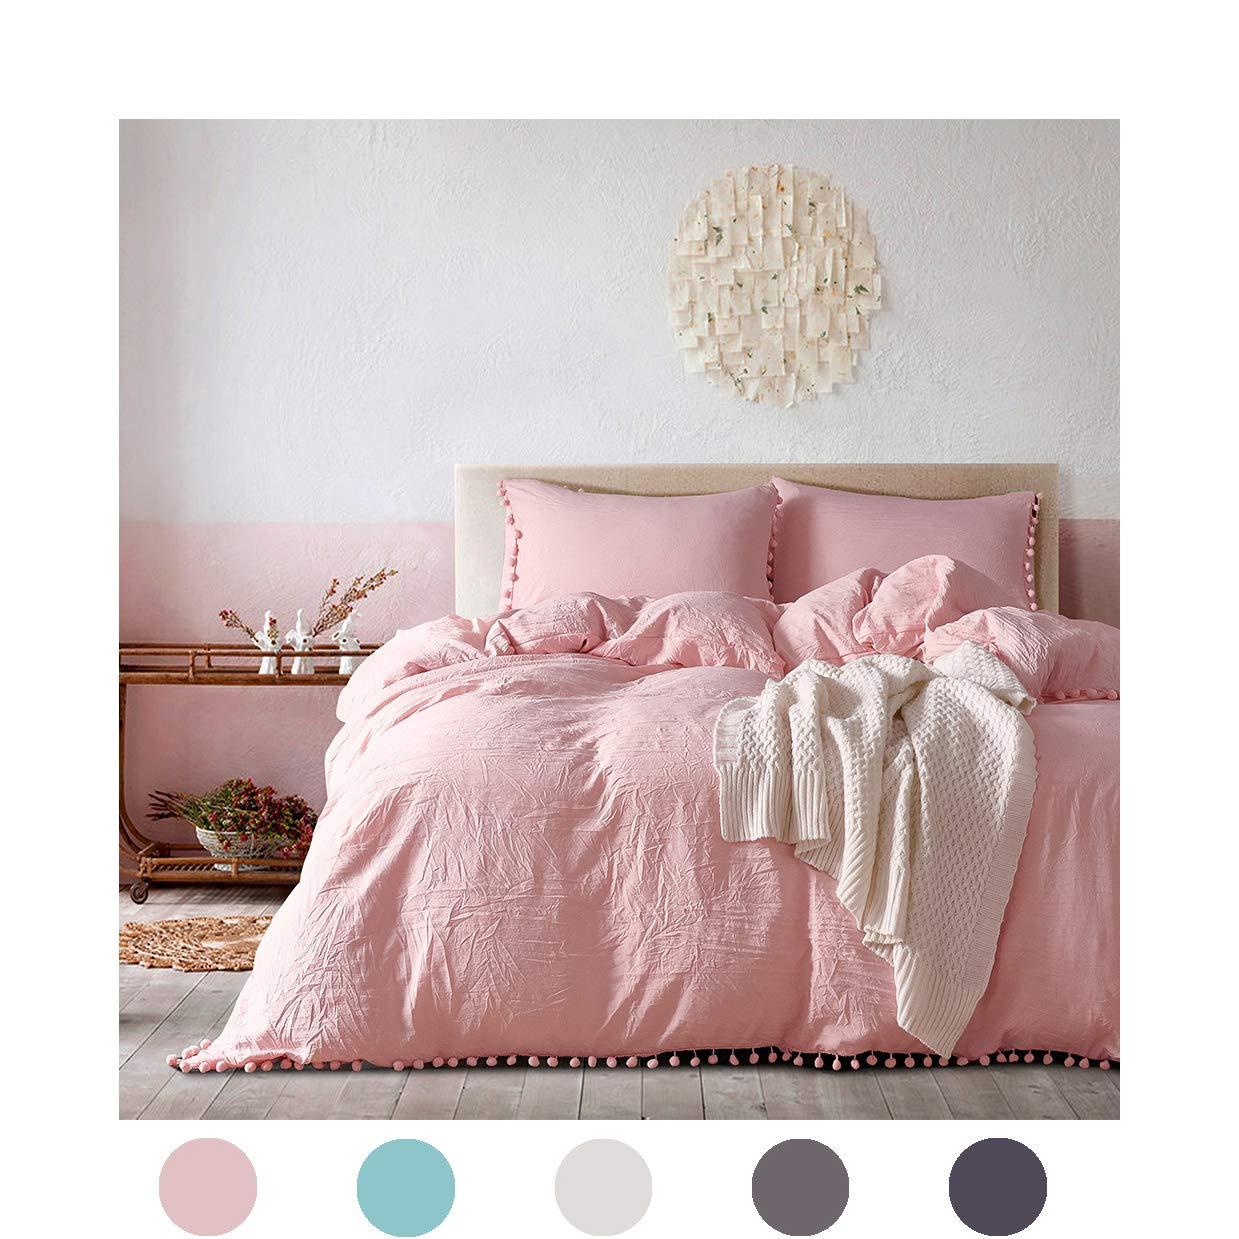 MOVE OVER 2 Pieces Pink Bedding Light Pink/Peach Duvet Cover Set Ball Fringe Pattern Design Soft Pink Girls Bedding Sets Twin 1 Duvet Cover 1 Ball Lace Pillow Sham (Twin, Peach/Pink)